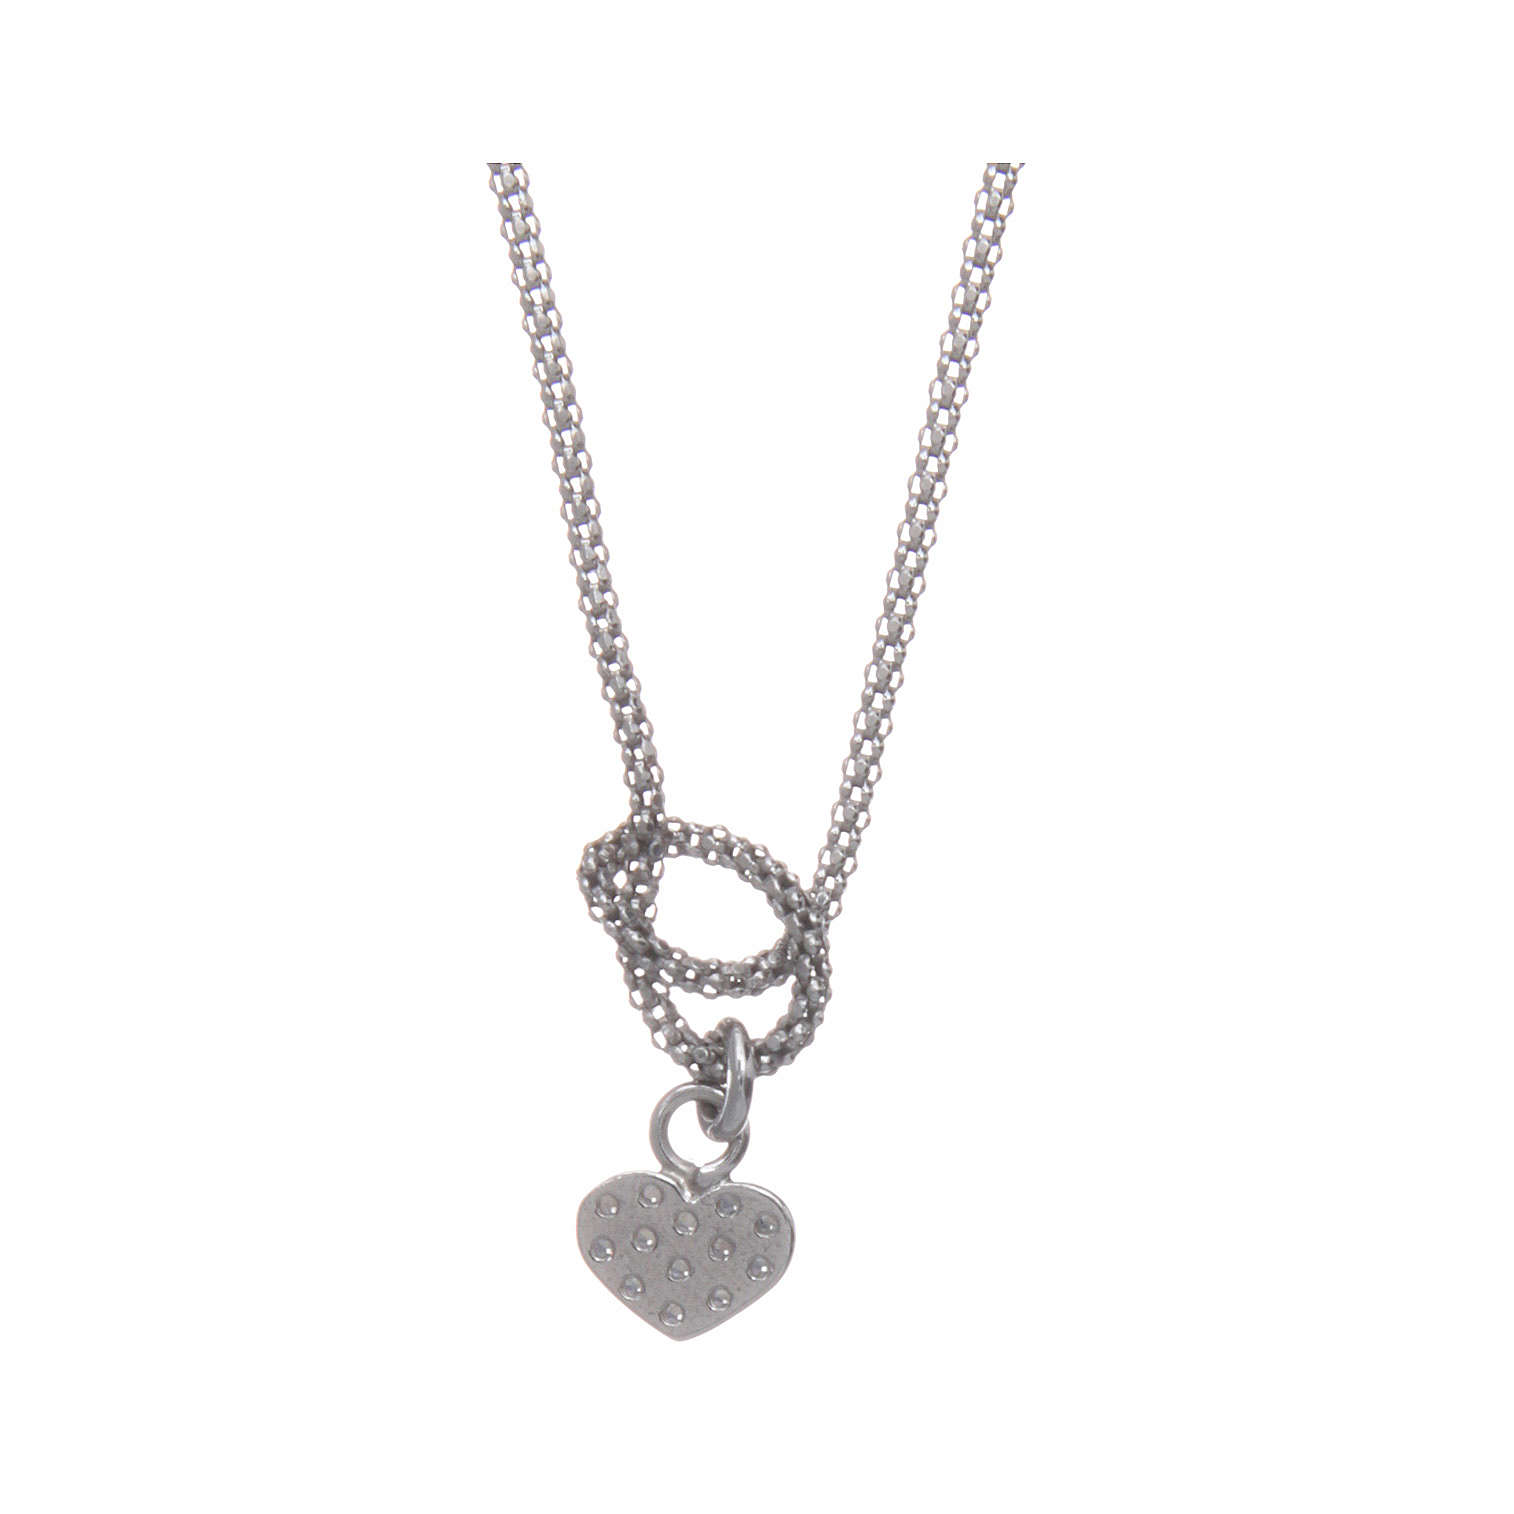 Collana Arg 925 rodiato AMEN con incrocio e cuore zirconato 4